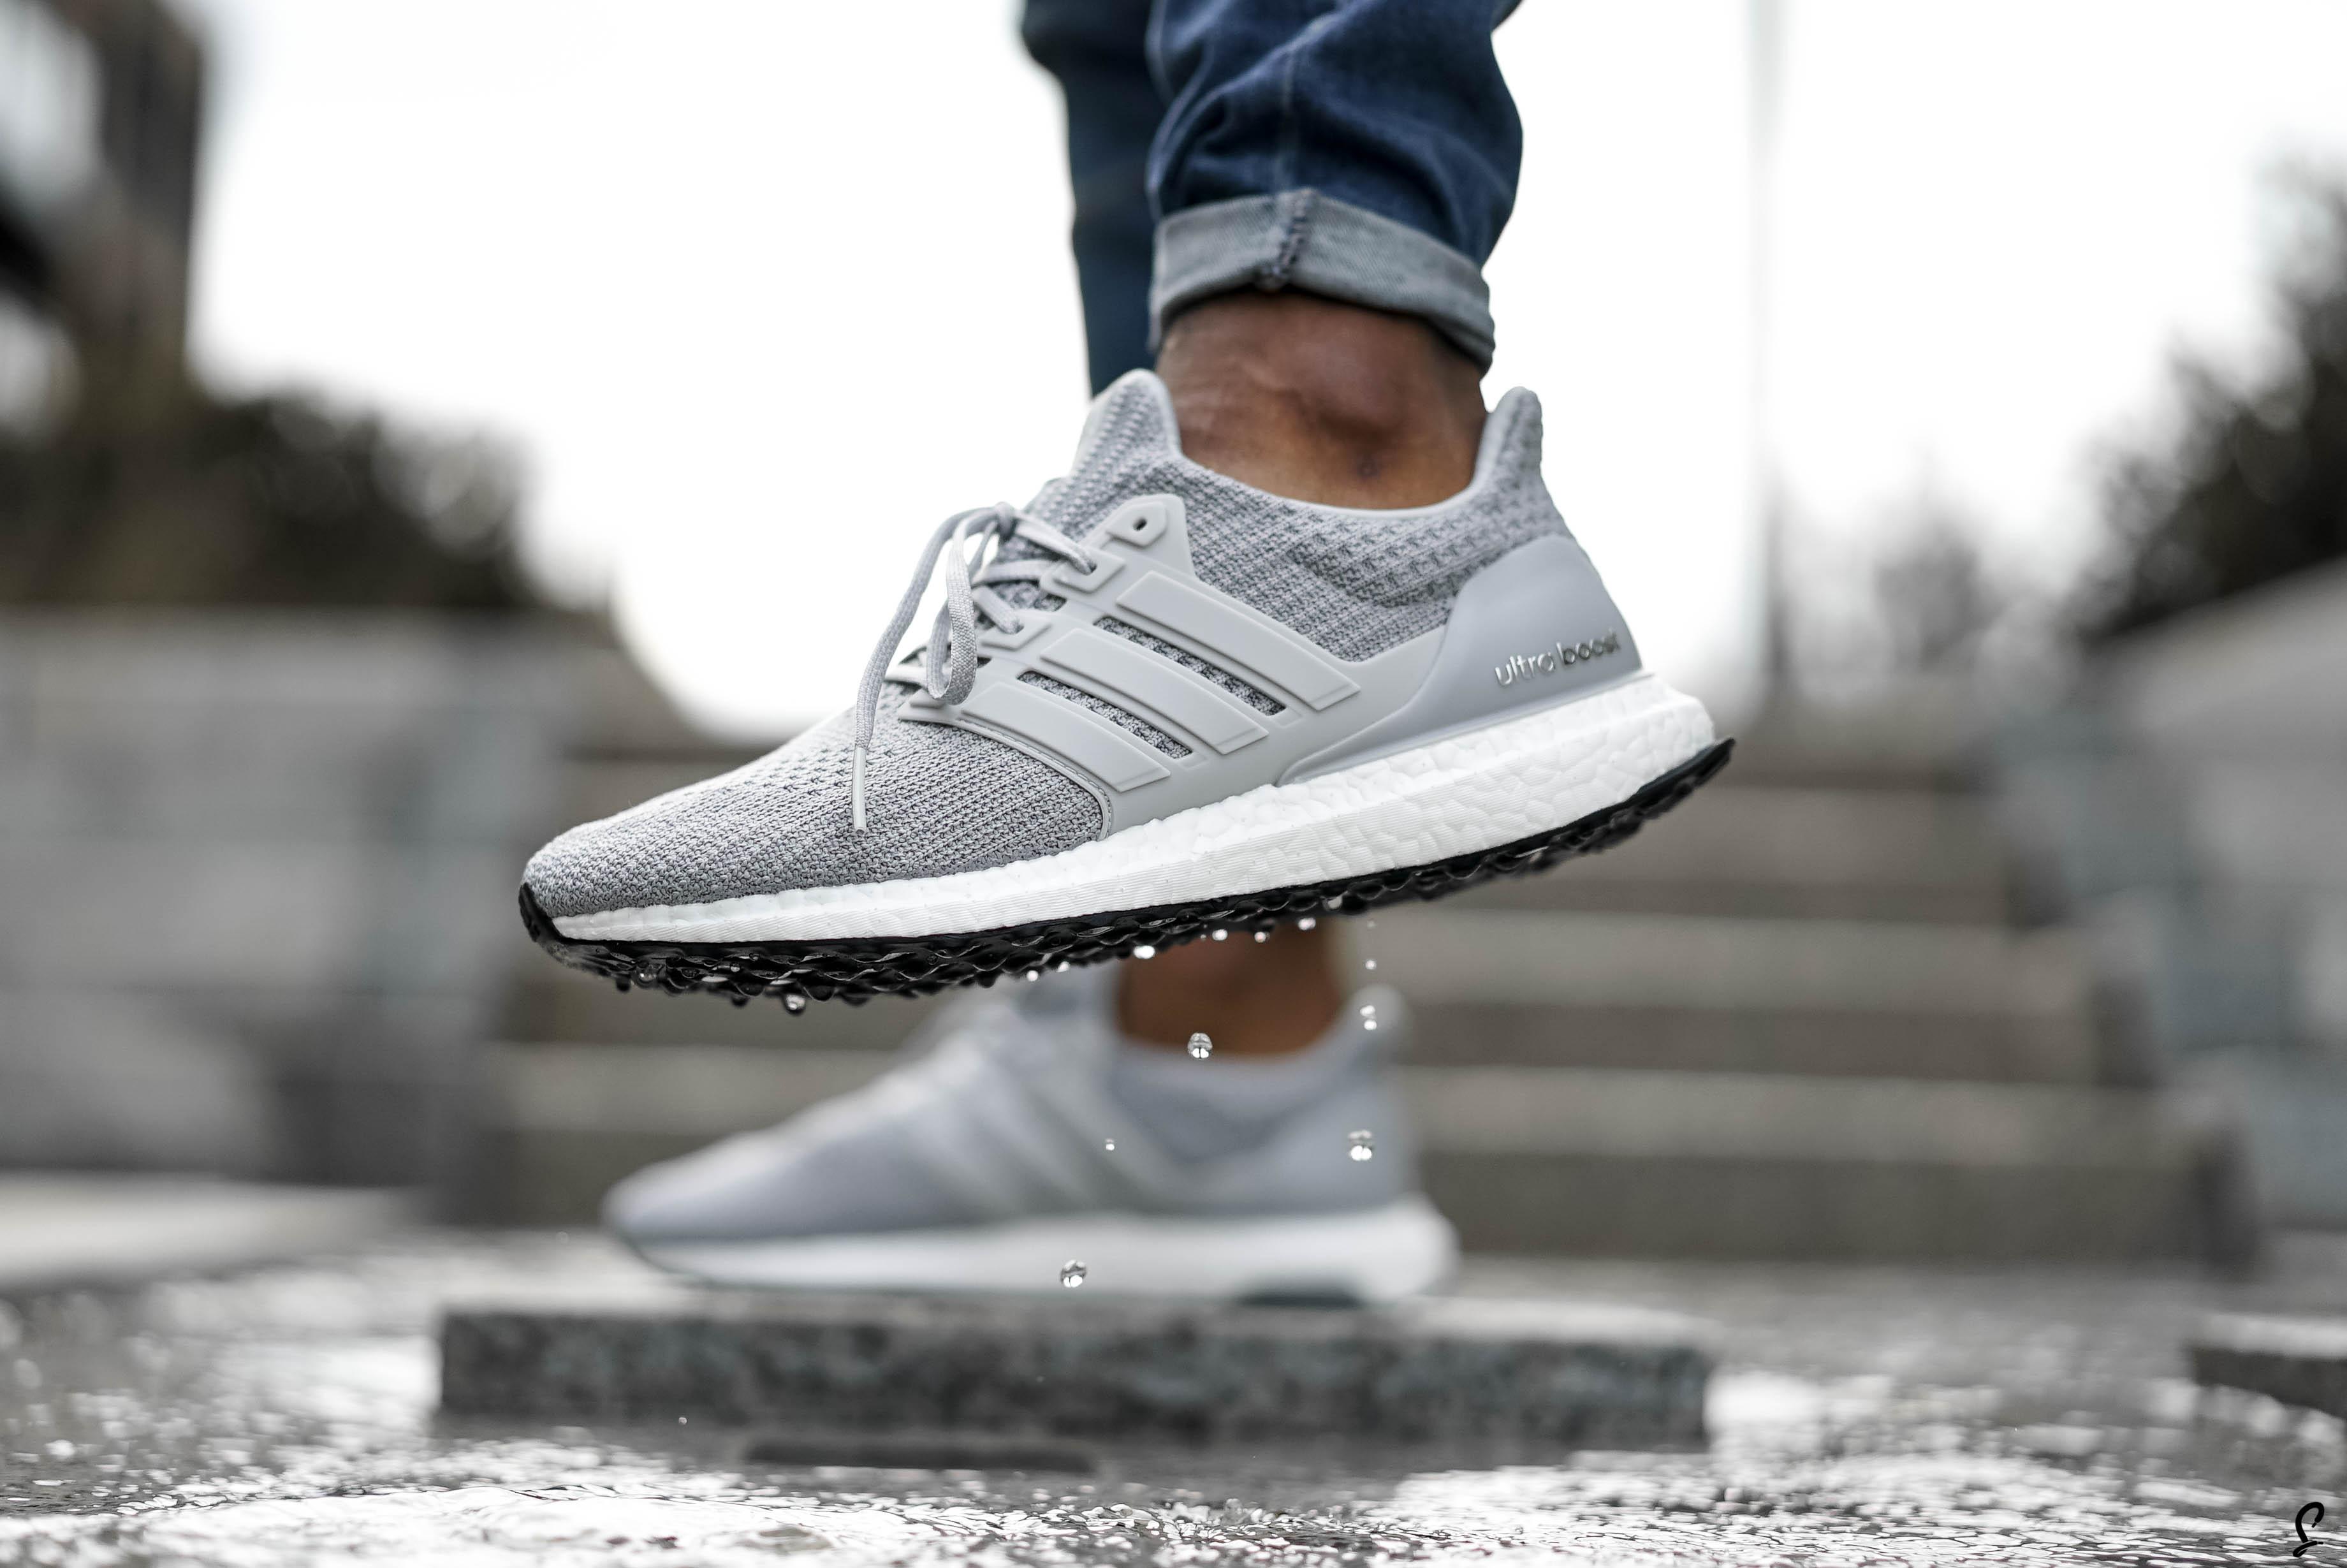 ultra boost 4.0 black on feet factory